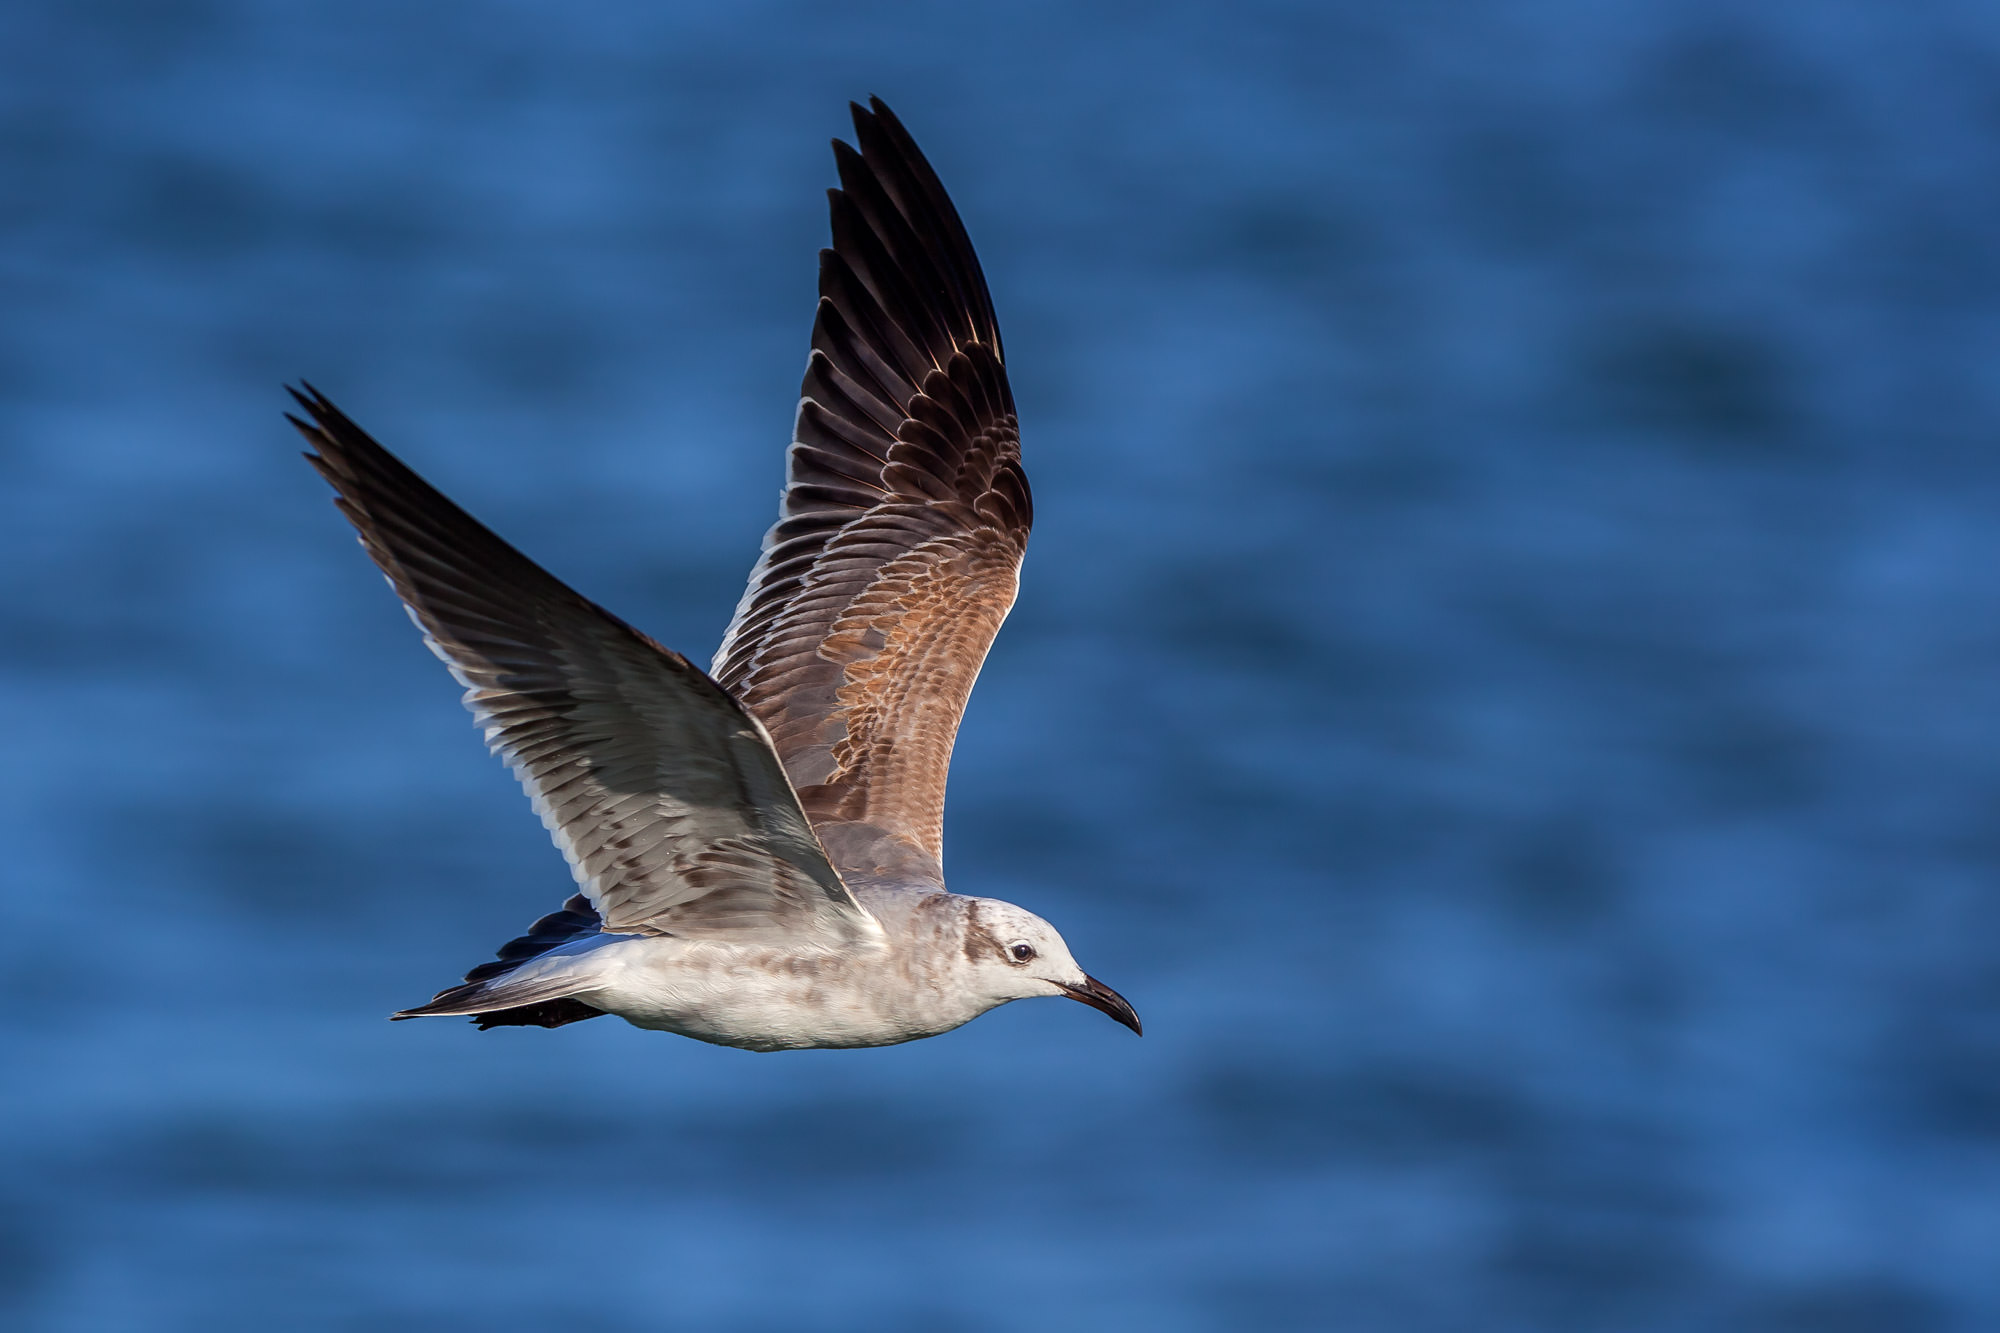 Gull, Flight, Florida, limited edition, photograph, photo